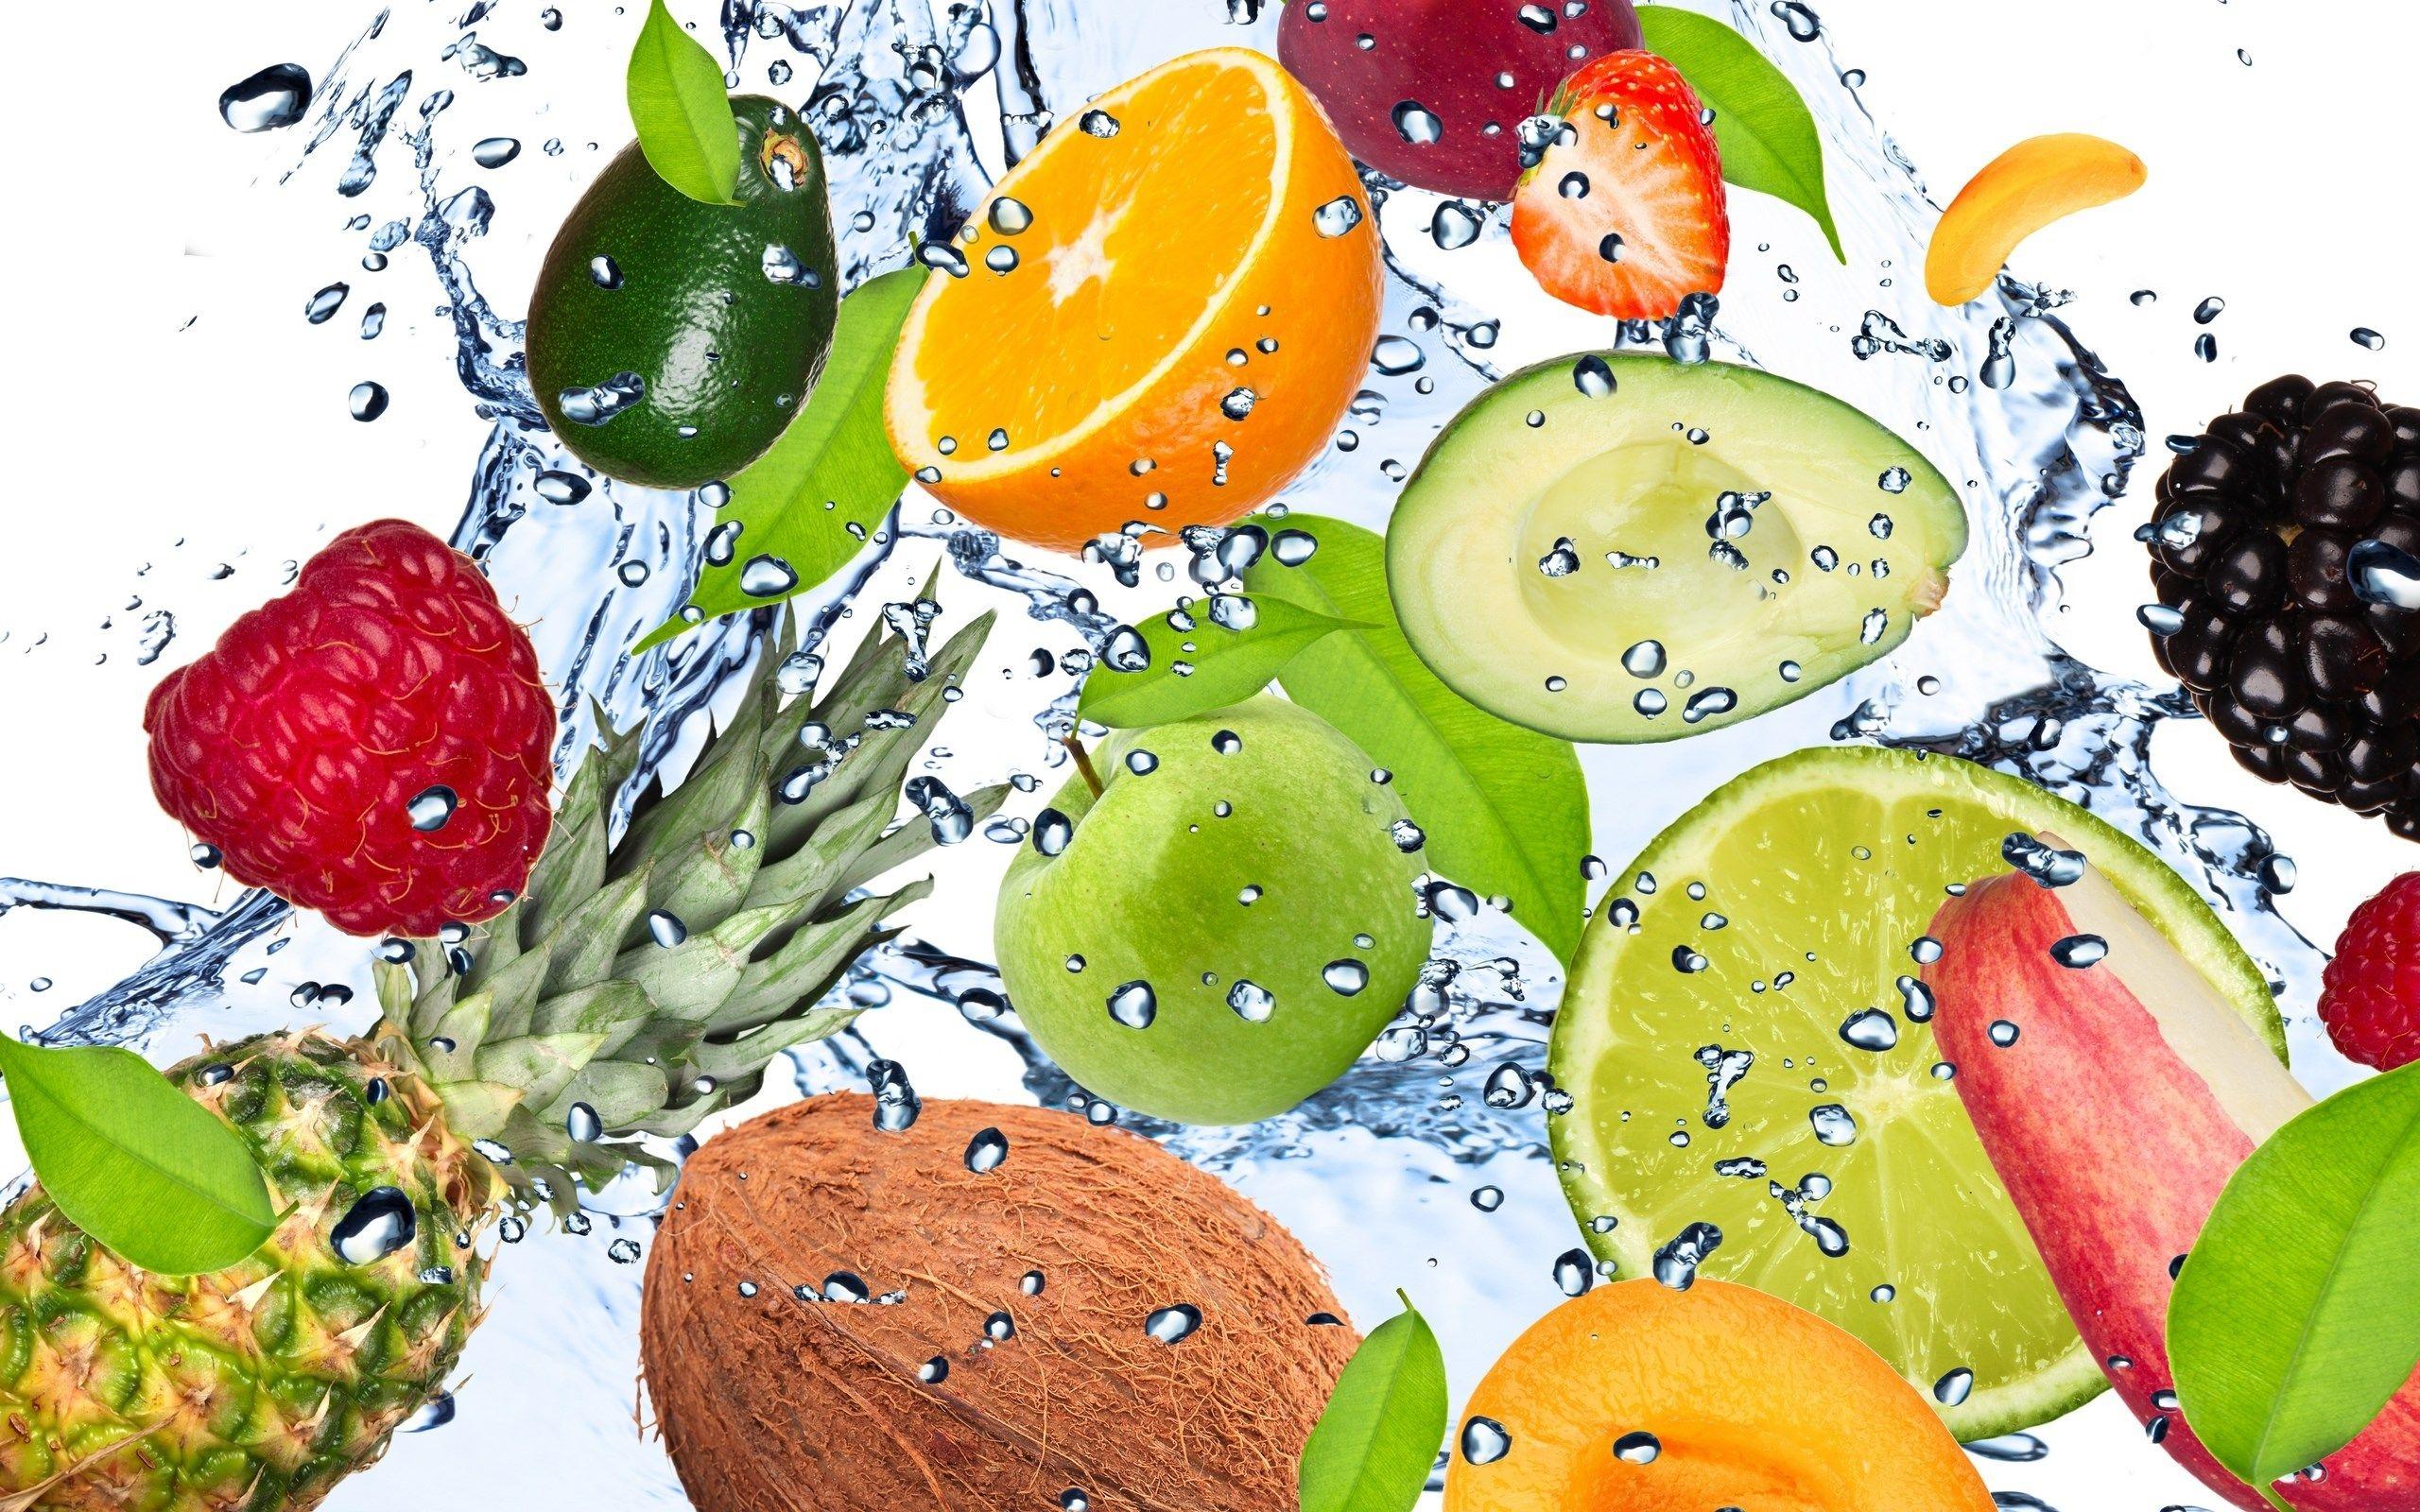 Free Desktop Backgrounds For Fruit Fruit Wallpaper